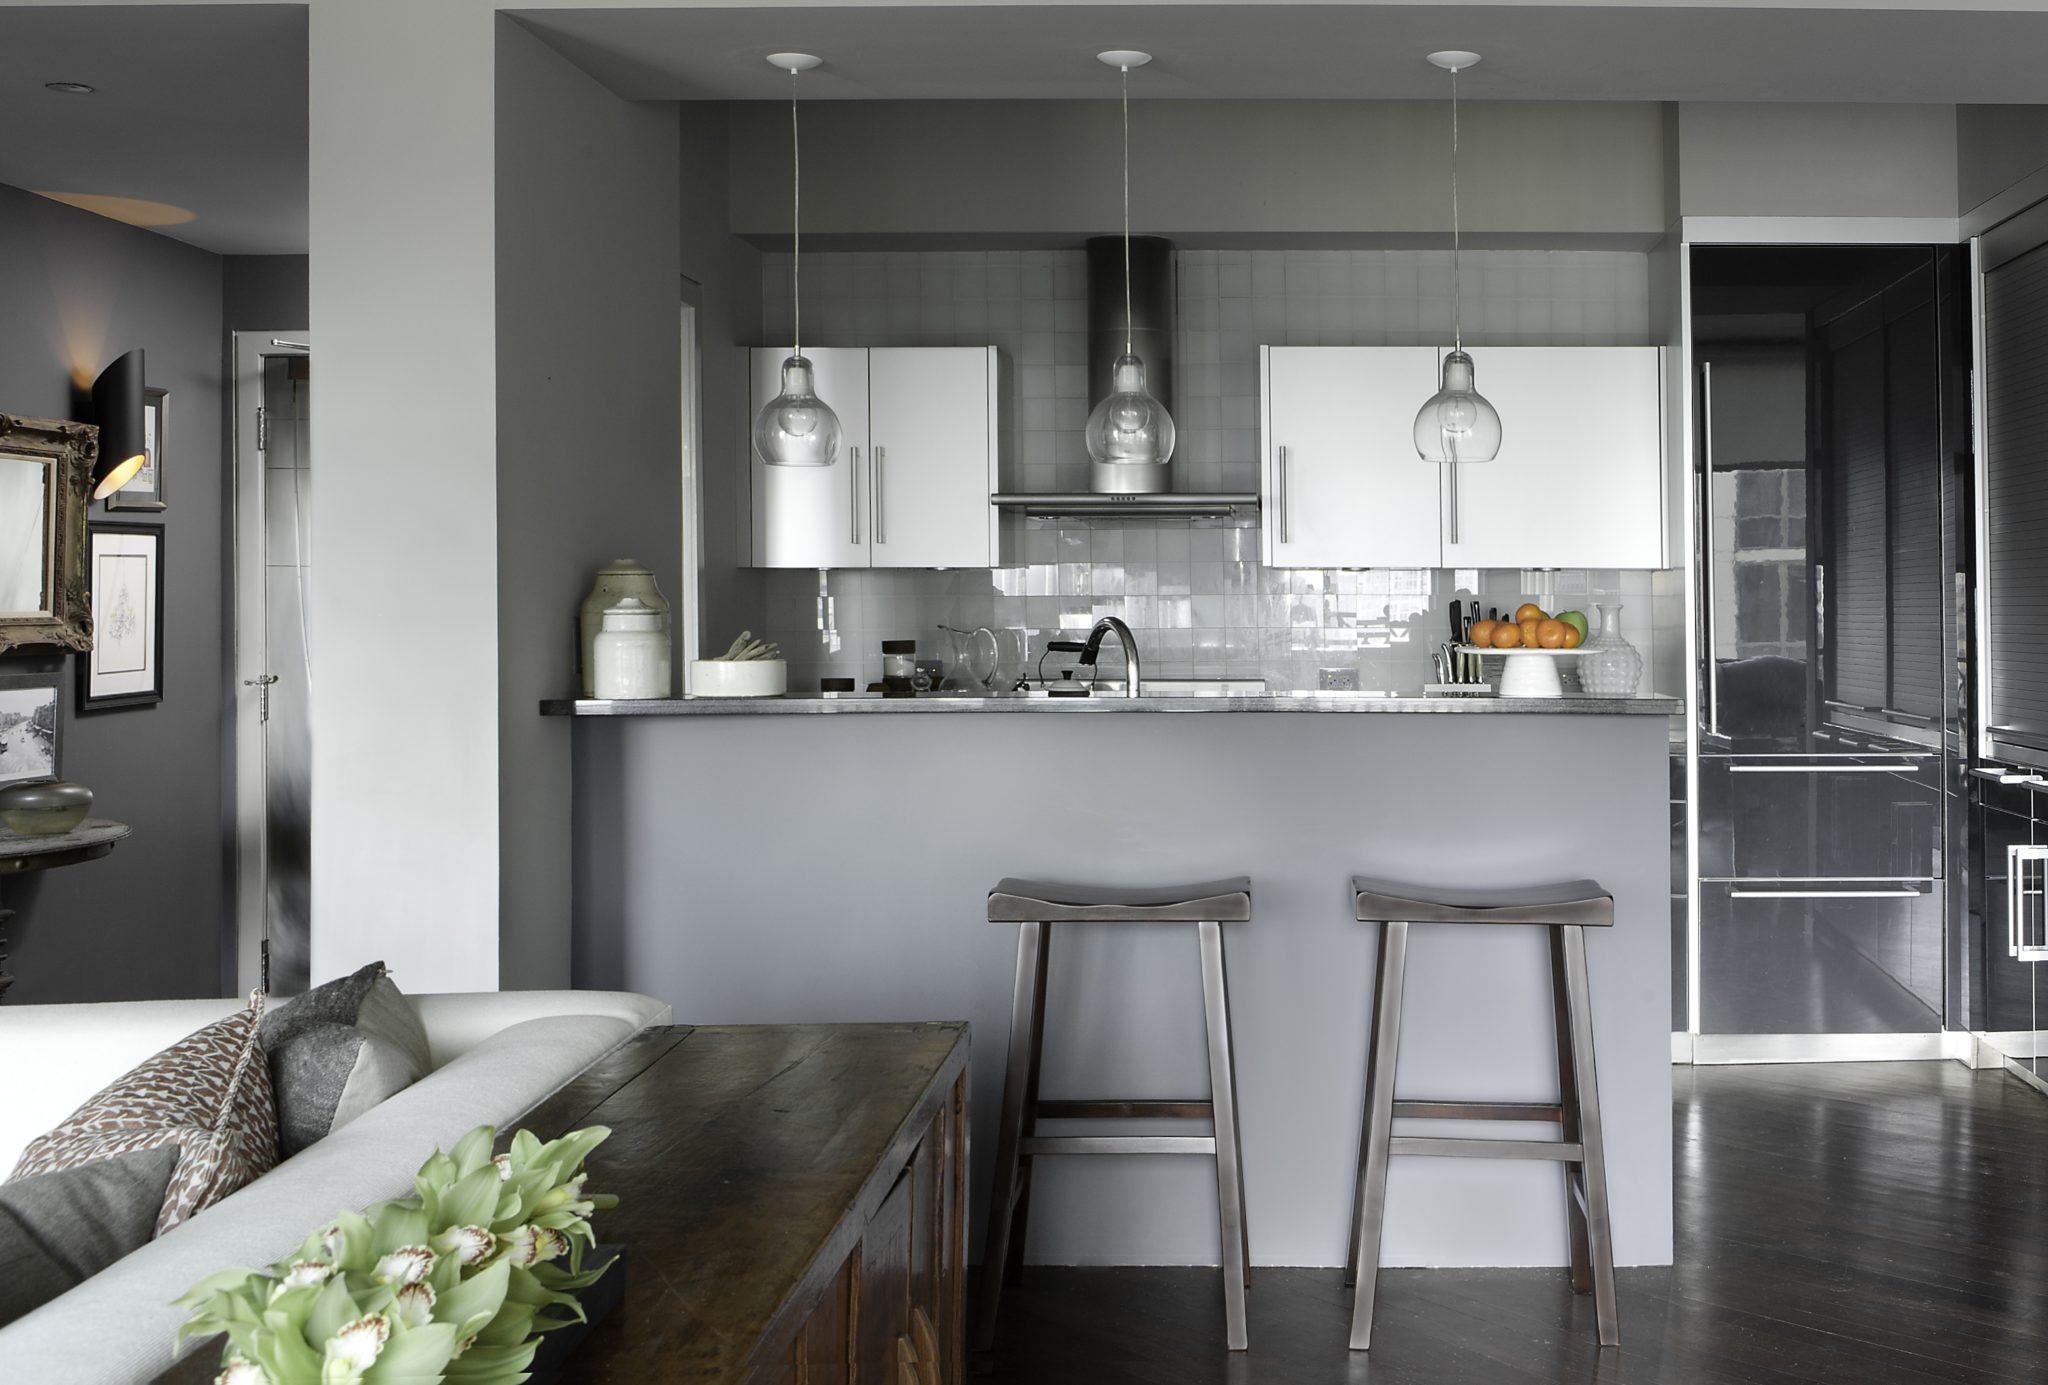 Huron Kitchen by Michael Del Piero Good Design